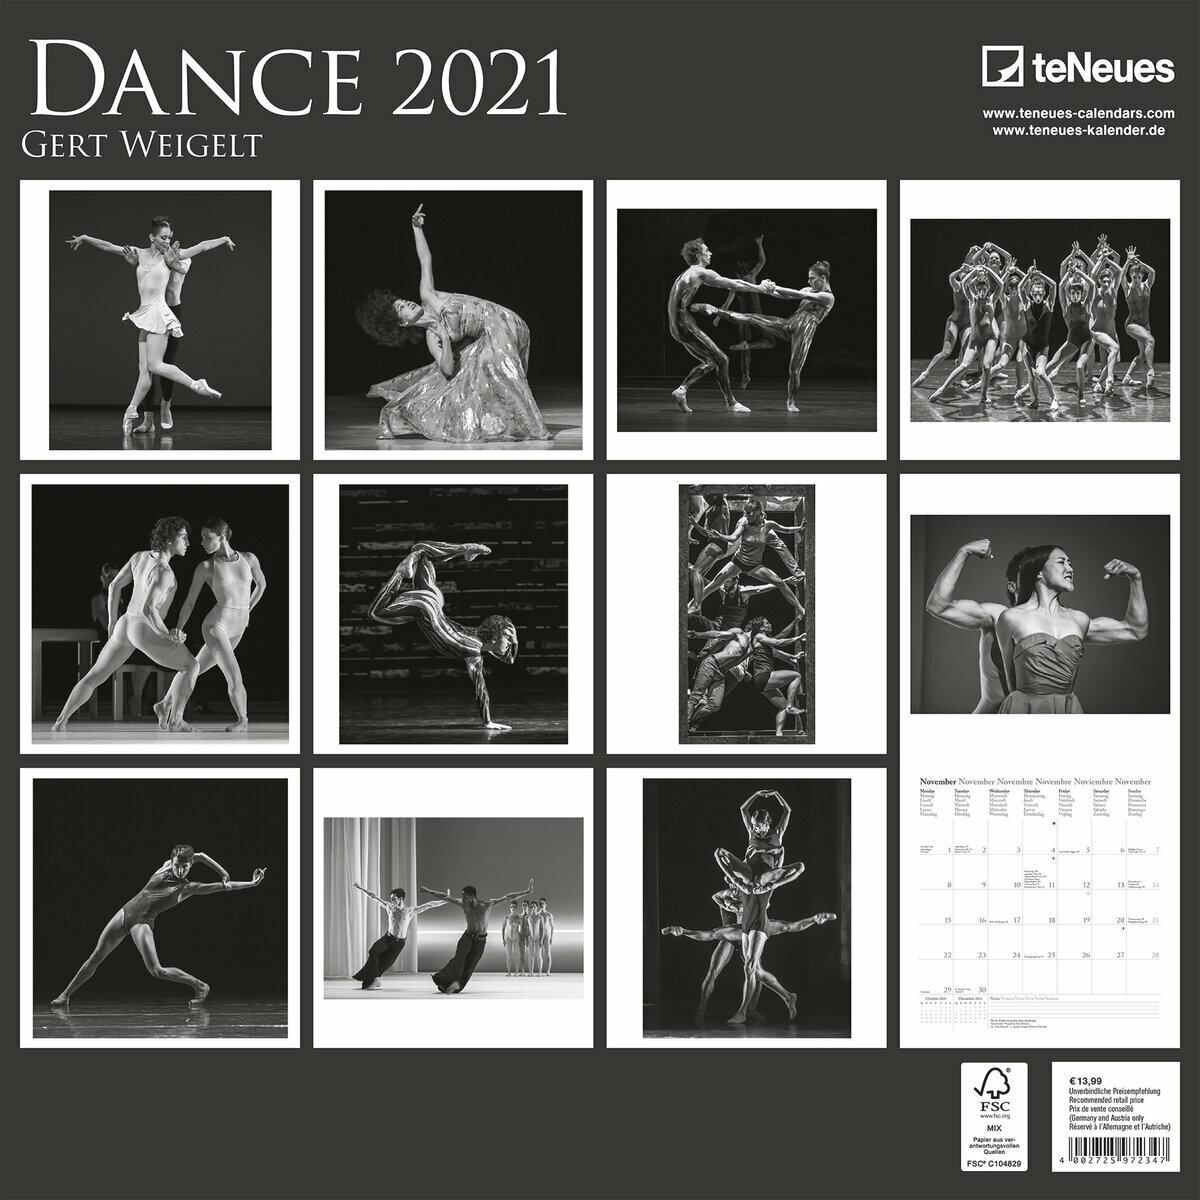 calendrier Danse 2021